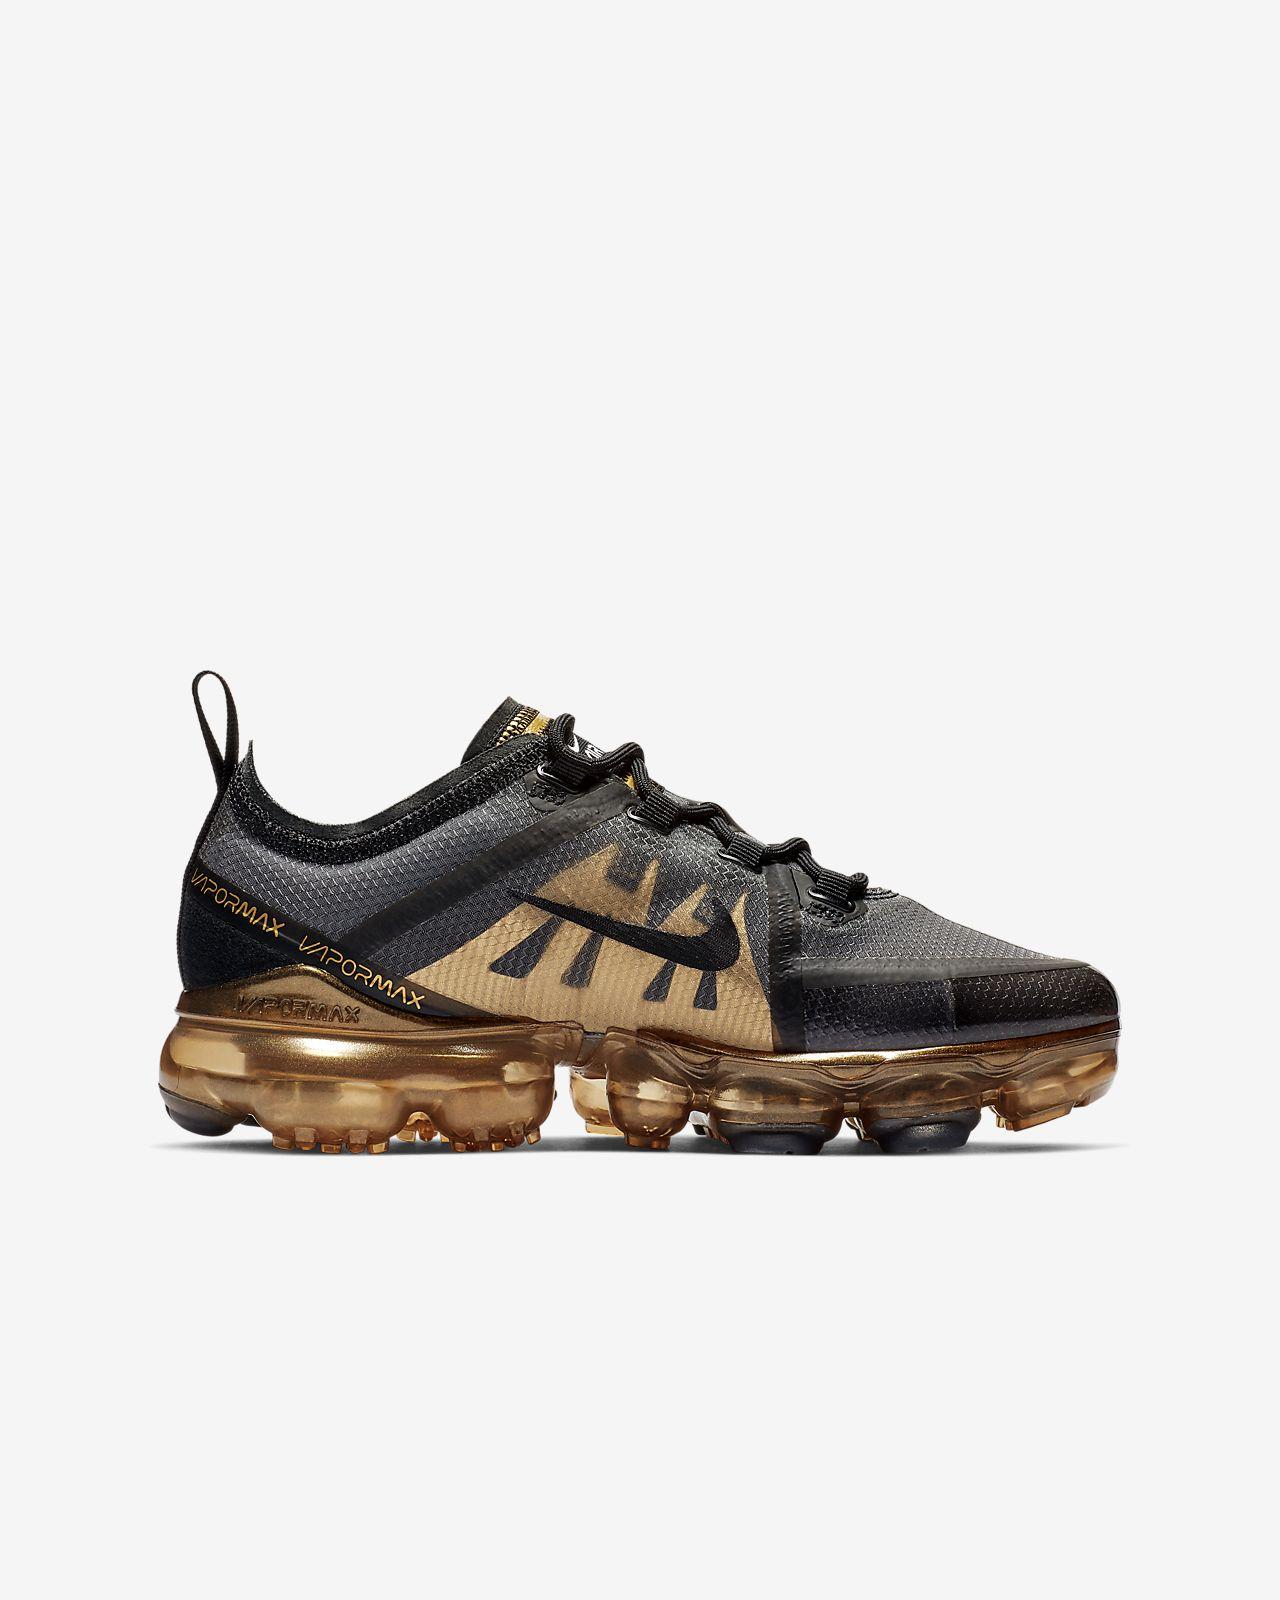 a6d2fbbefb04 Nike Air VaporMax 2019 Older Kids  Shoe. Nike.com SA